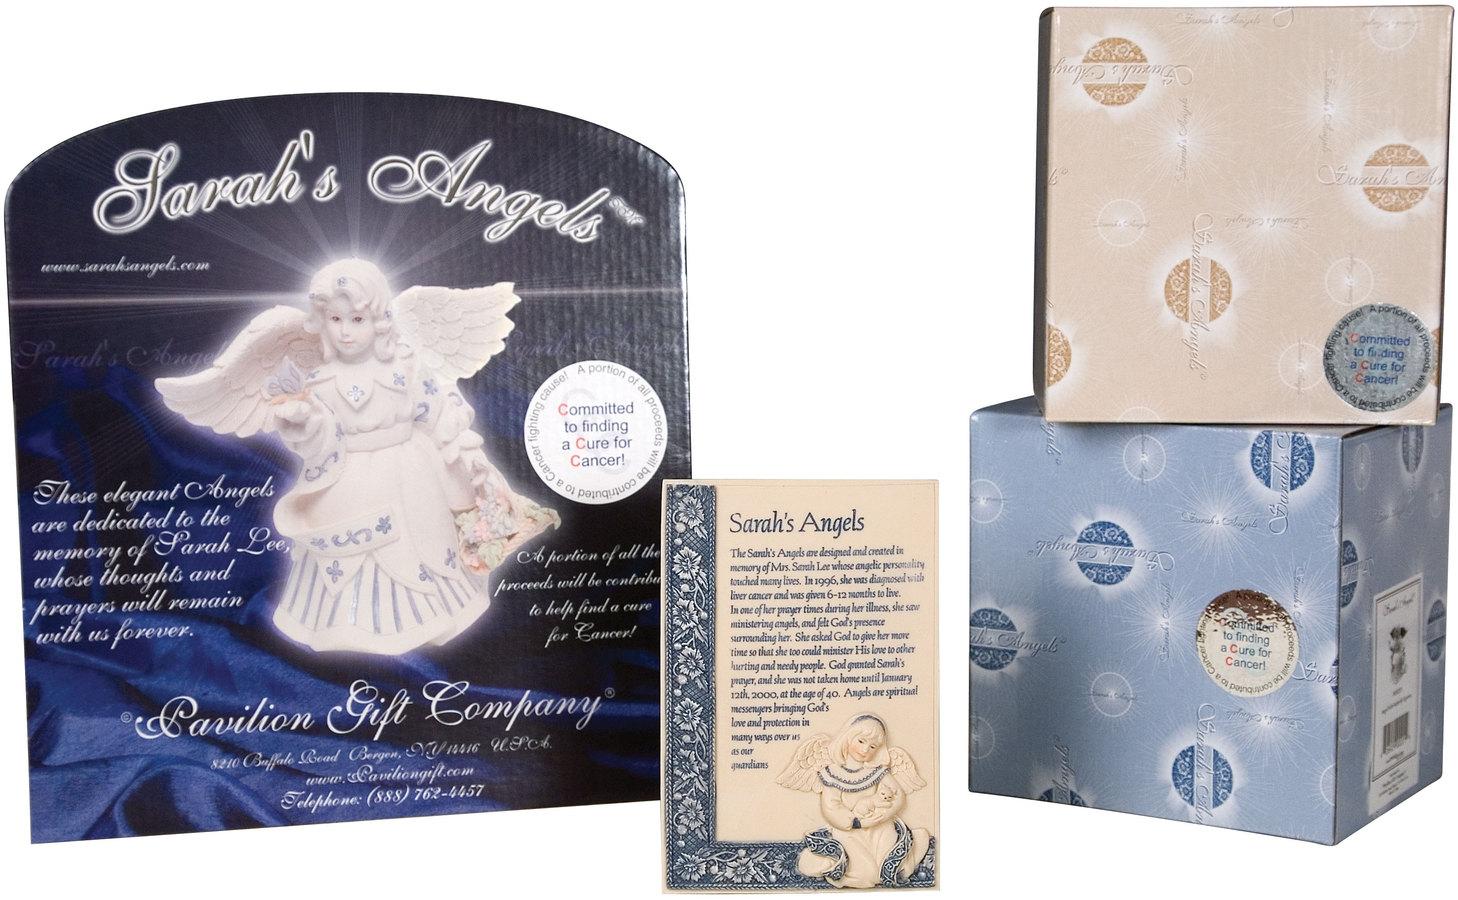 Angel Figurine Holding Baby 3.5 Pavilion Gift Company 06194 Pavilion